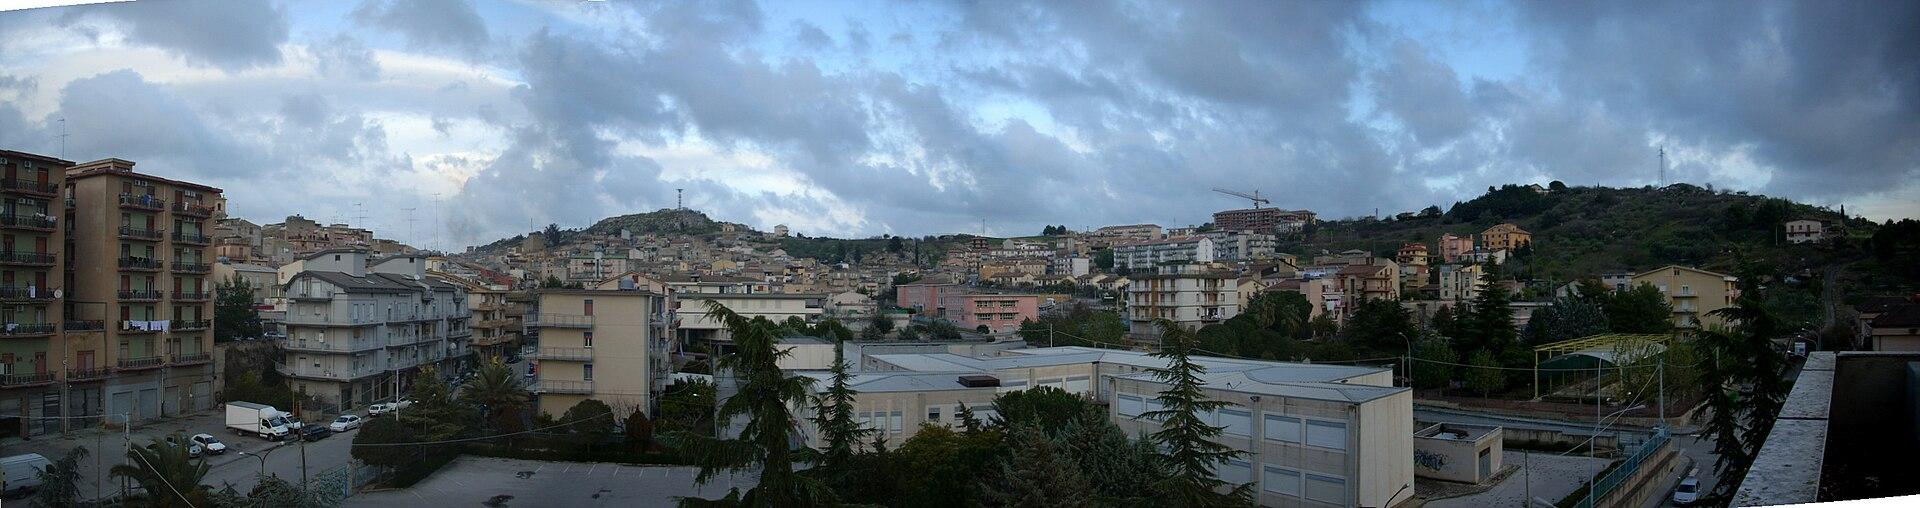 Serradifalco – Veduta